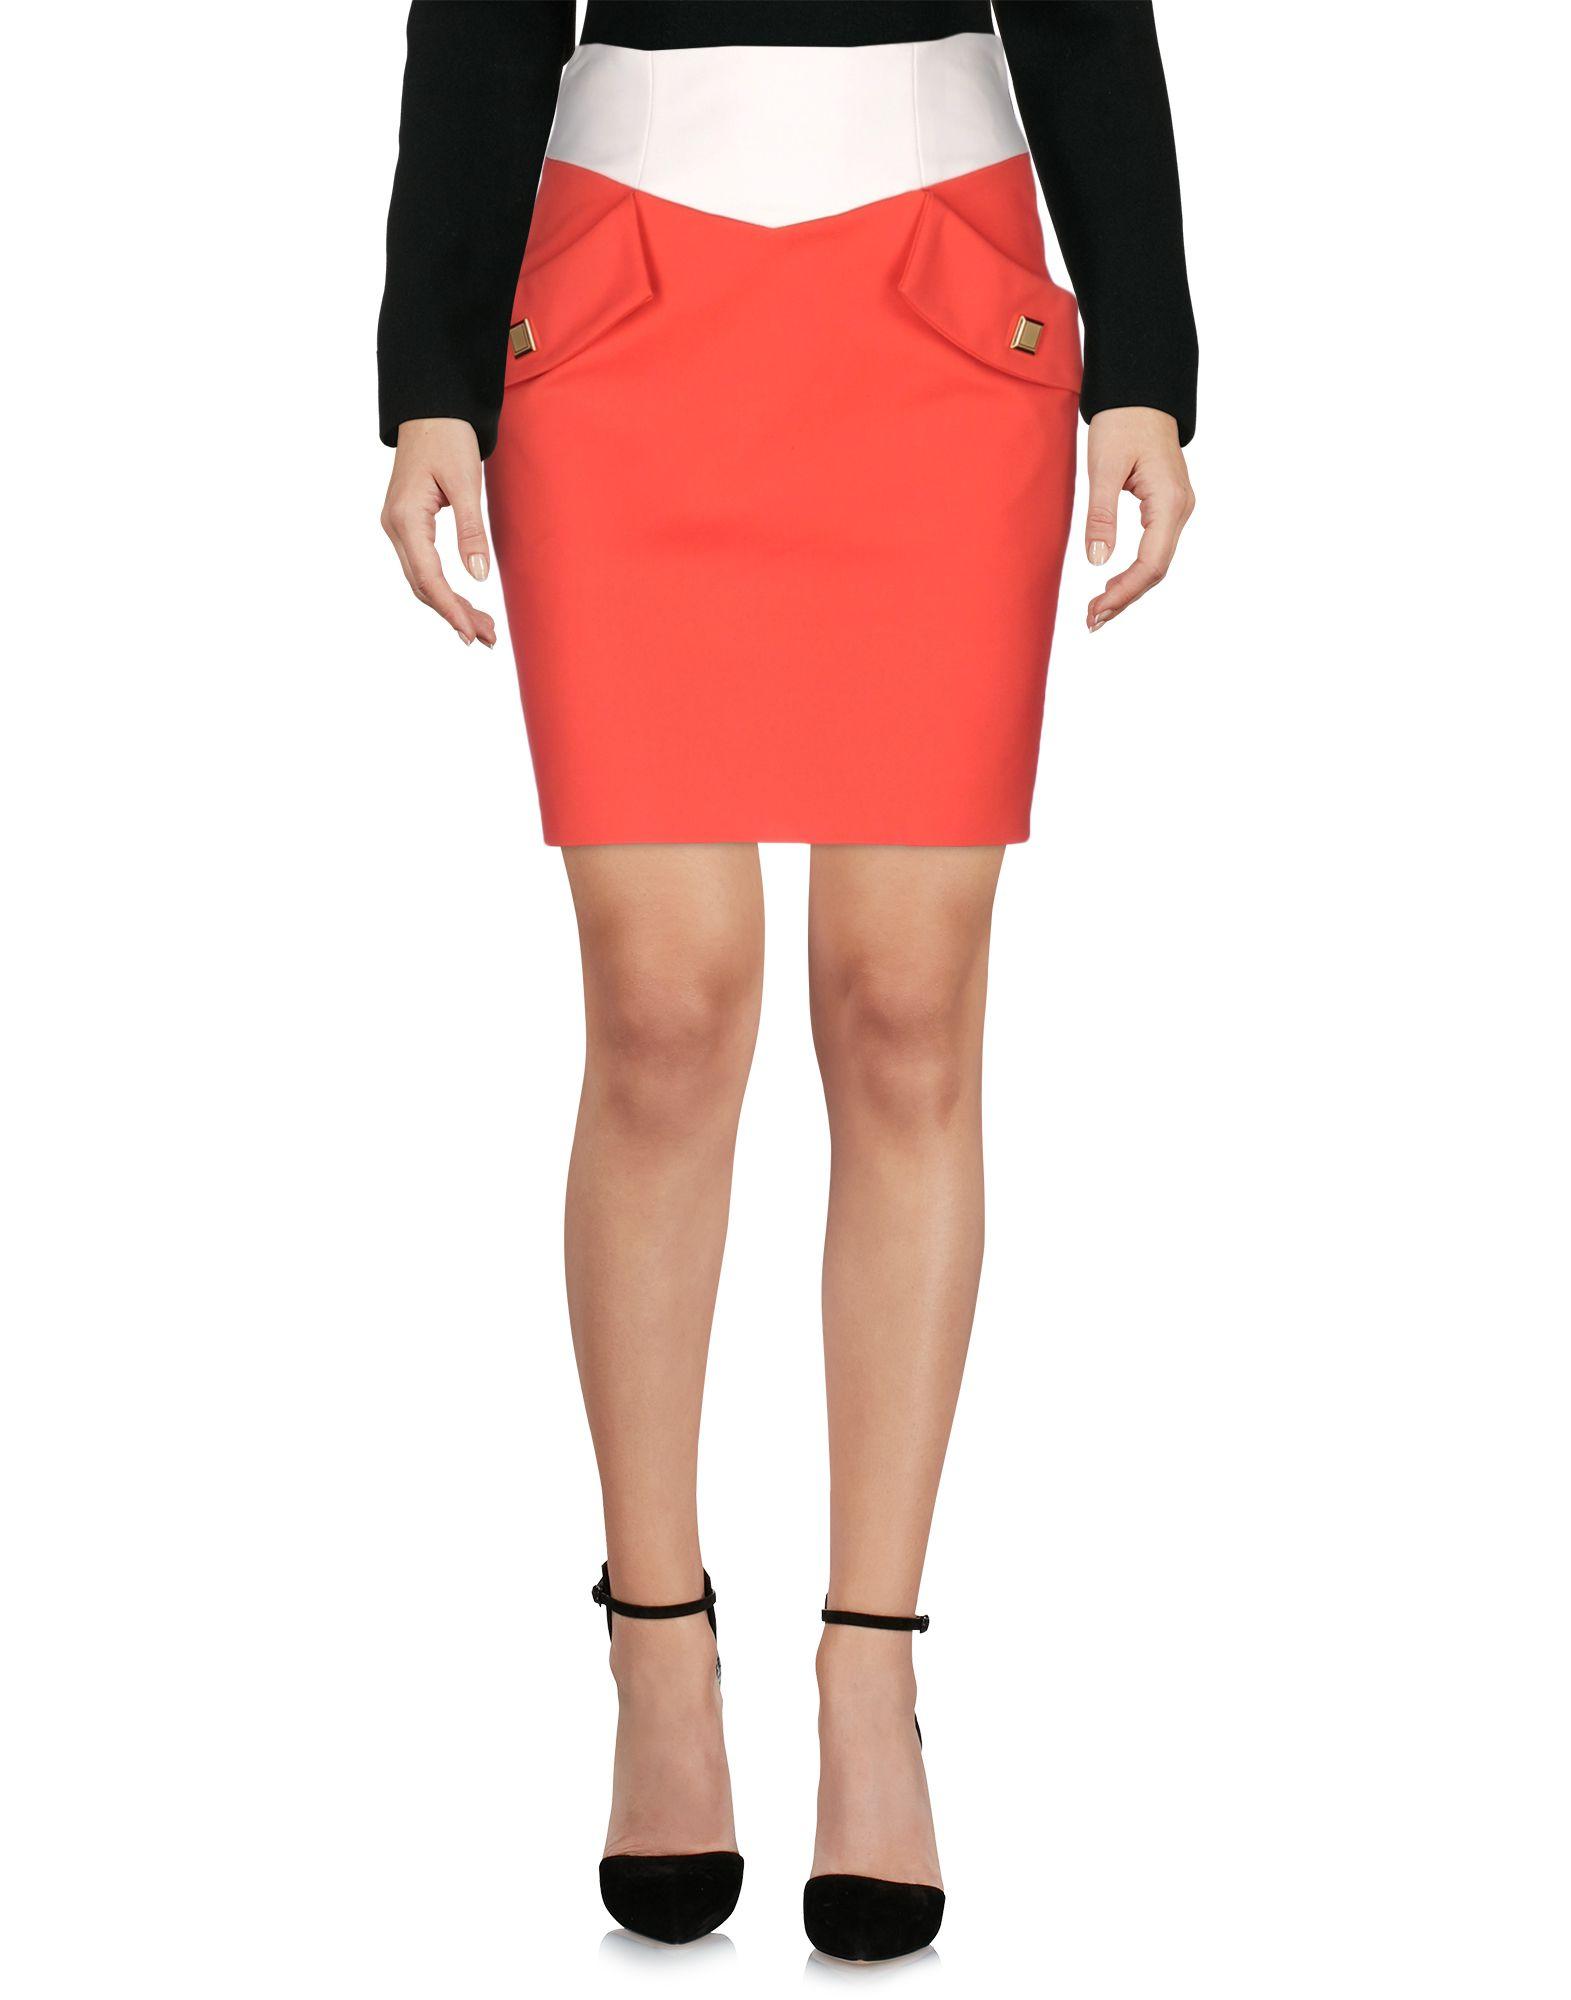 EMANUEL UNGARO Damen Knielanger Rock Farbe Rot Größe 3